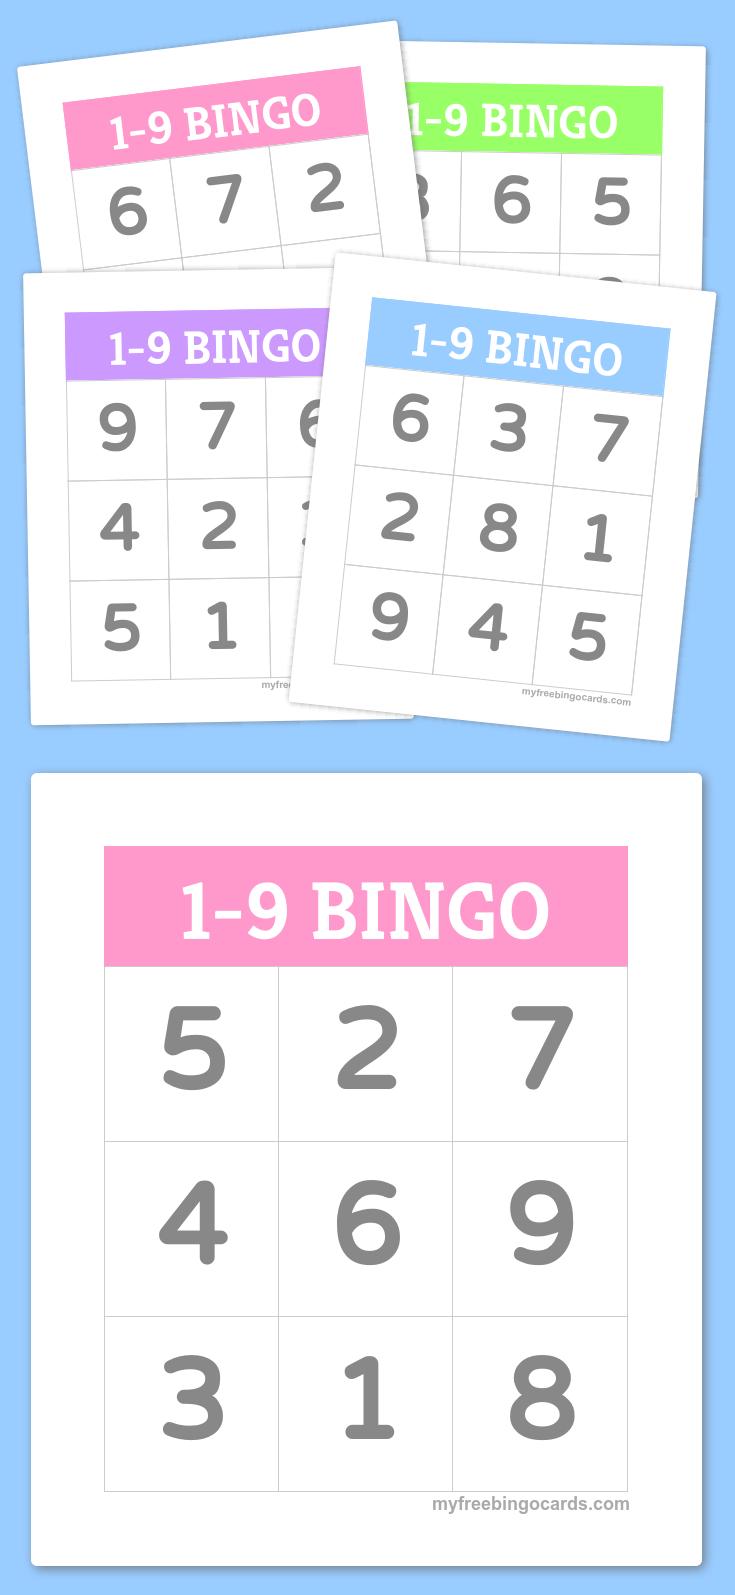 1-9 Bingo | Numbers | Bingo For Kids, Bingo, Free Printable Bingo Cards - Free Printable Bingo Cards With Numbers